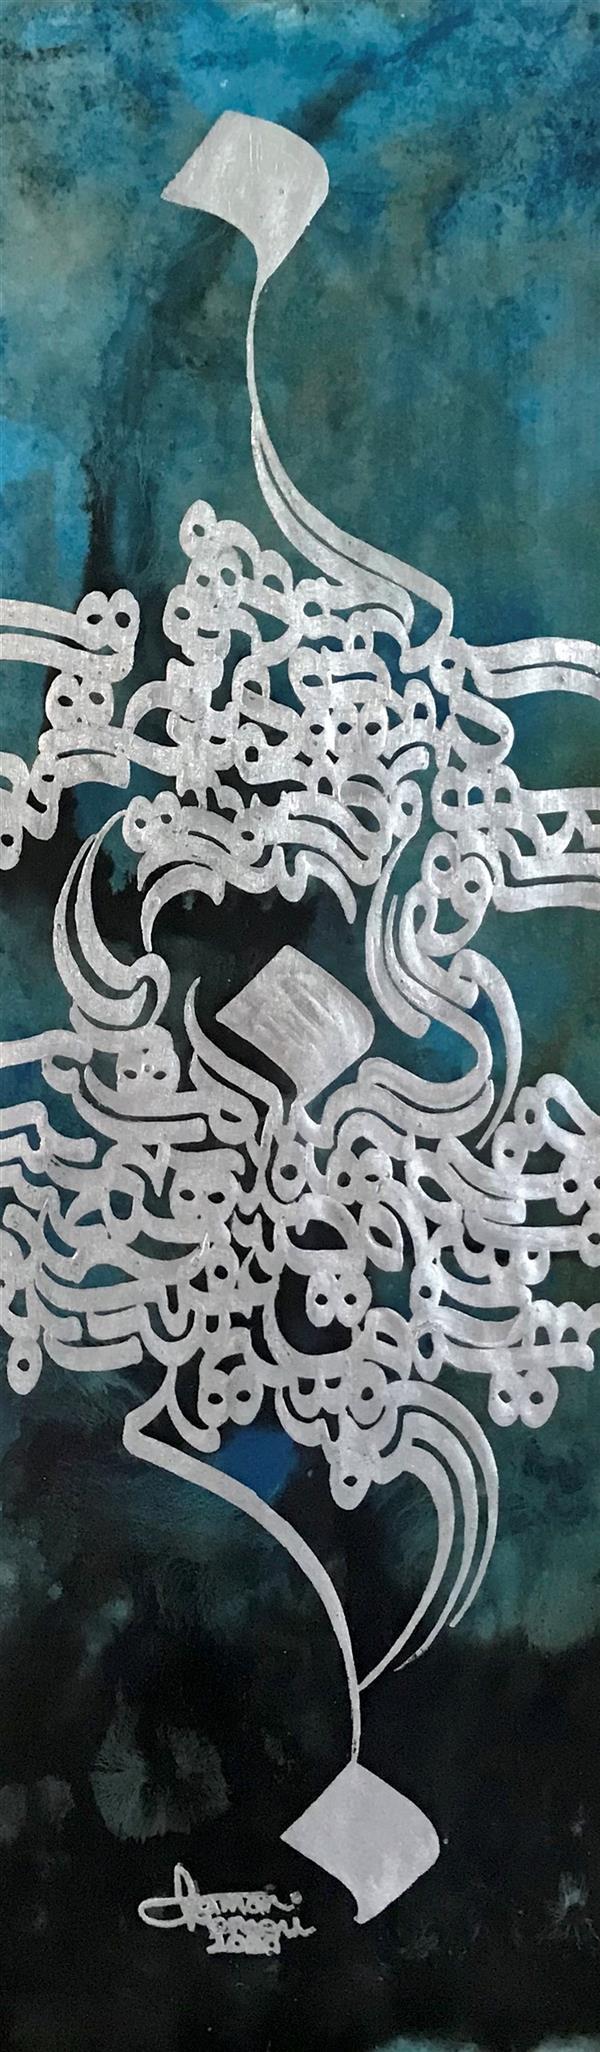 هنر خوشنویسی محفل خوشنویسی کورش مومنی . در آغوشِ آسمان  Embrace the sky Mix media on paper 2019 15*50 cm با قاب و پاسپارتو #art#calligraphy#calligraphyart#calligraphypainting#kereshmeh_shirin#kereshmeh#naghashikhat #کرشمه_شیرین #کرشمه #خوشنویسی #نقاشیخط #فروخته_شد